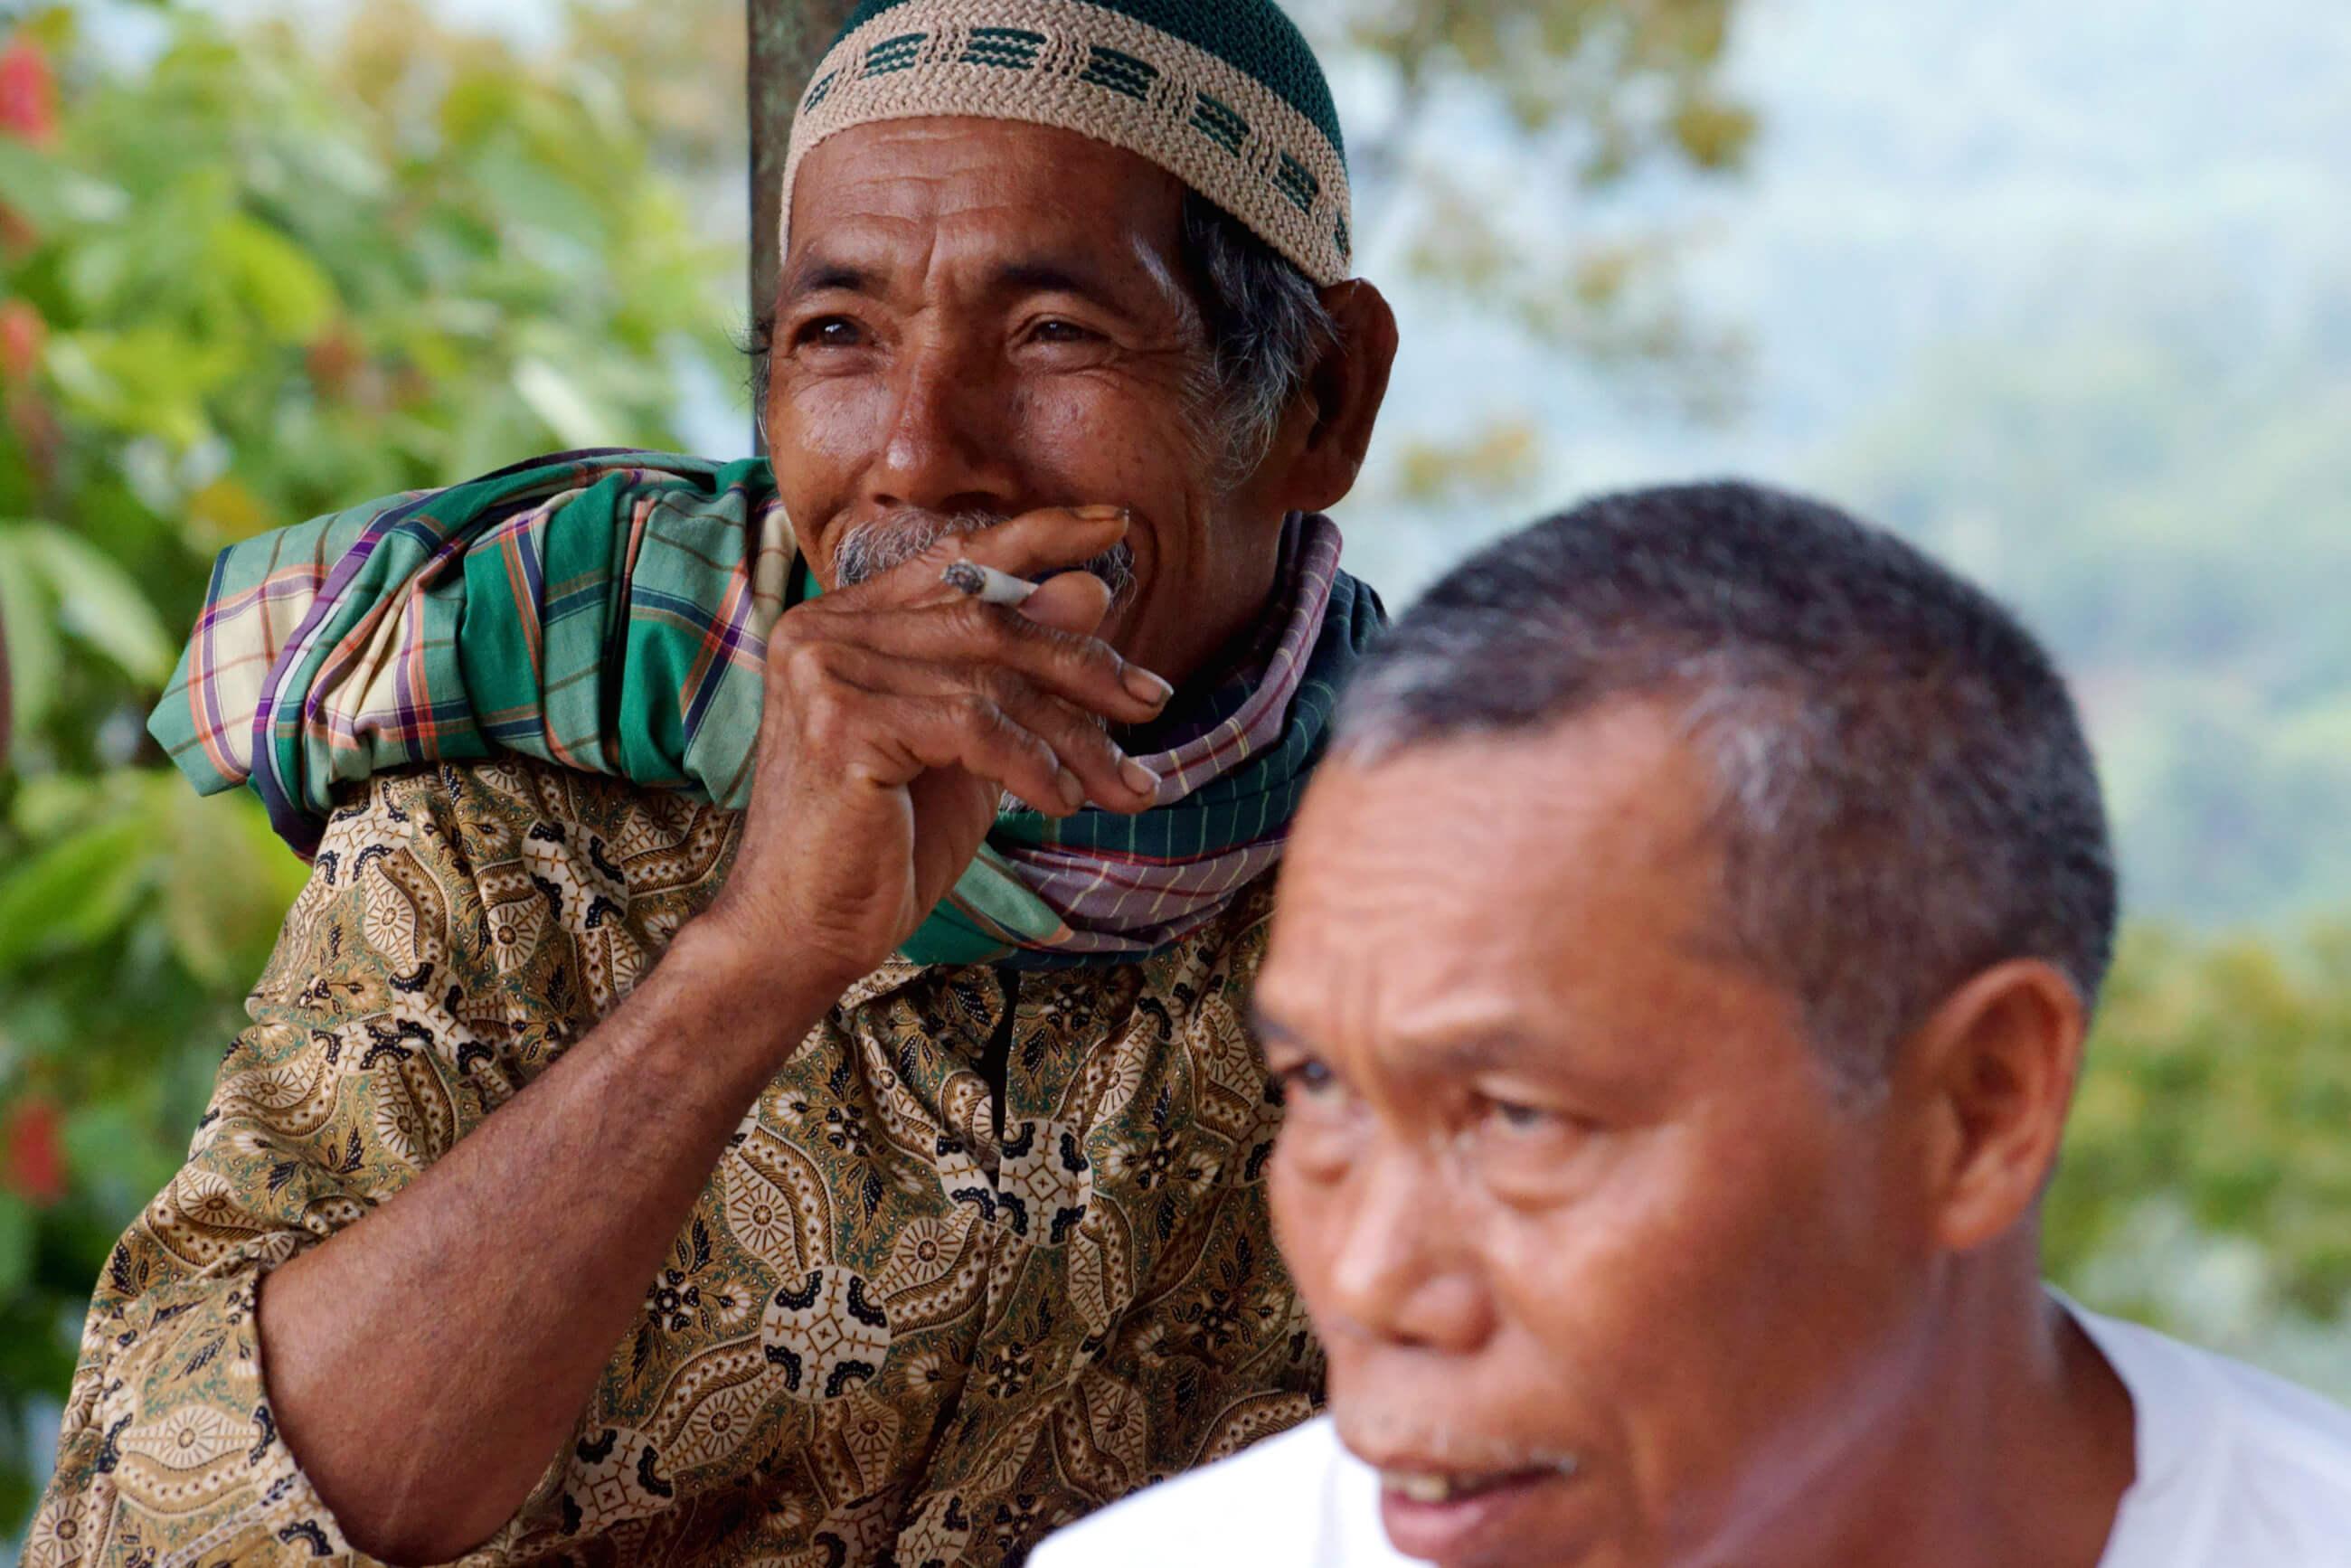 https://bubo.sk/uploads/galleries/7396/archiv_jozefzeliznakst_indonezia_sumatra_05-2014-164-.jpg